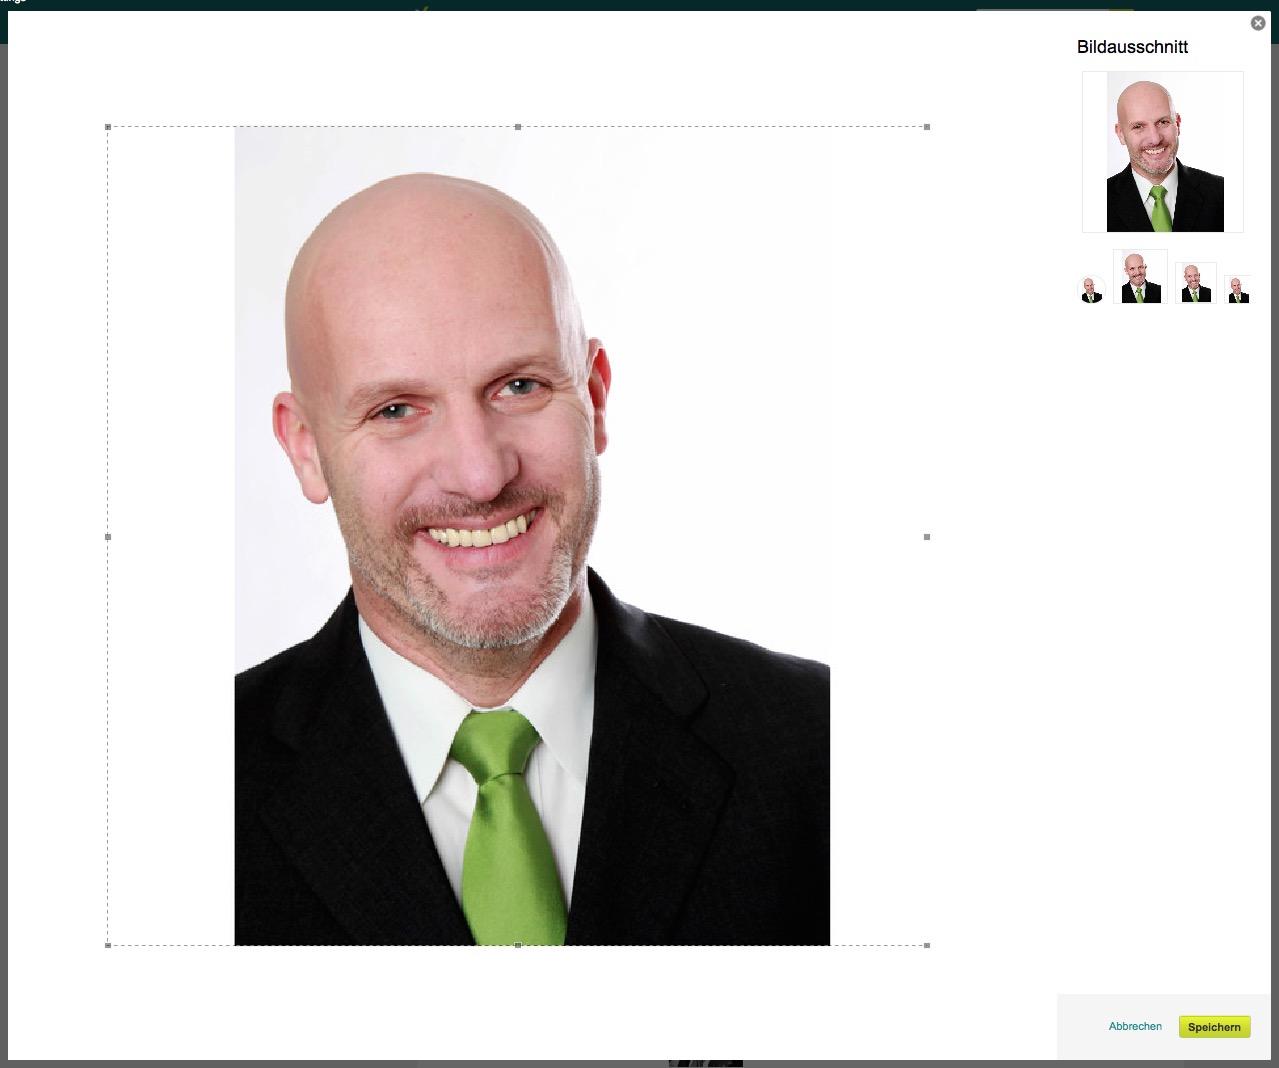 bildauschnitt-profilbild-bearbeitet